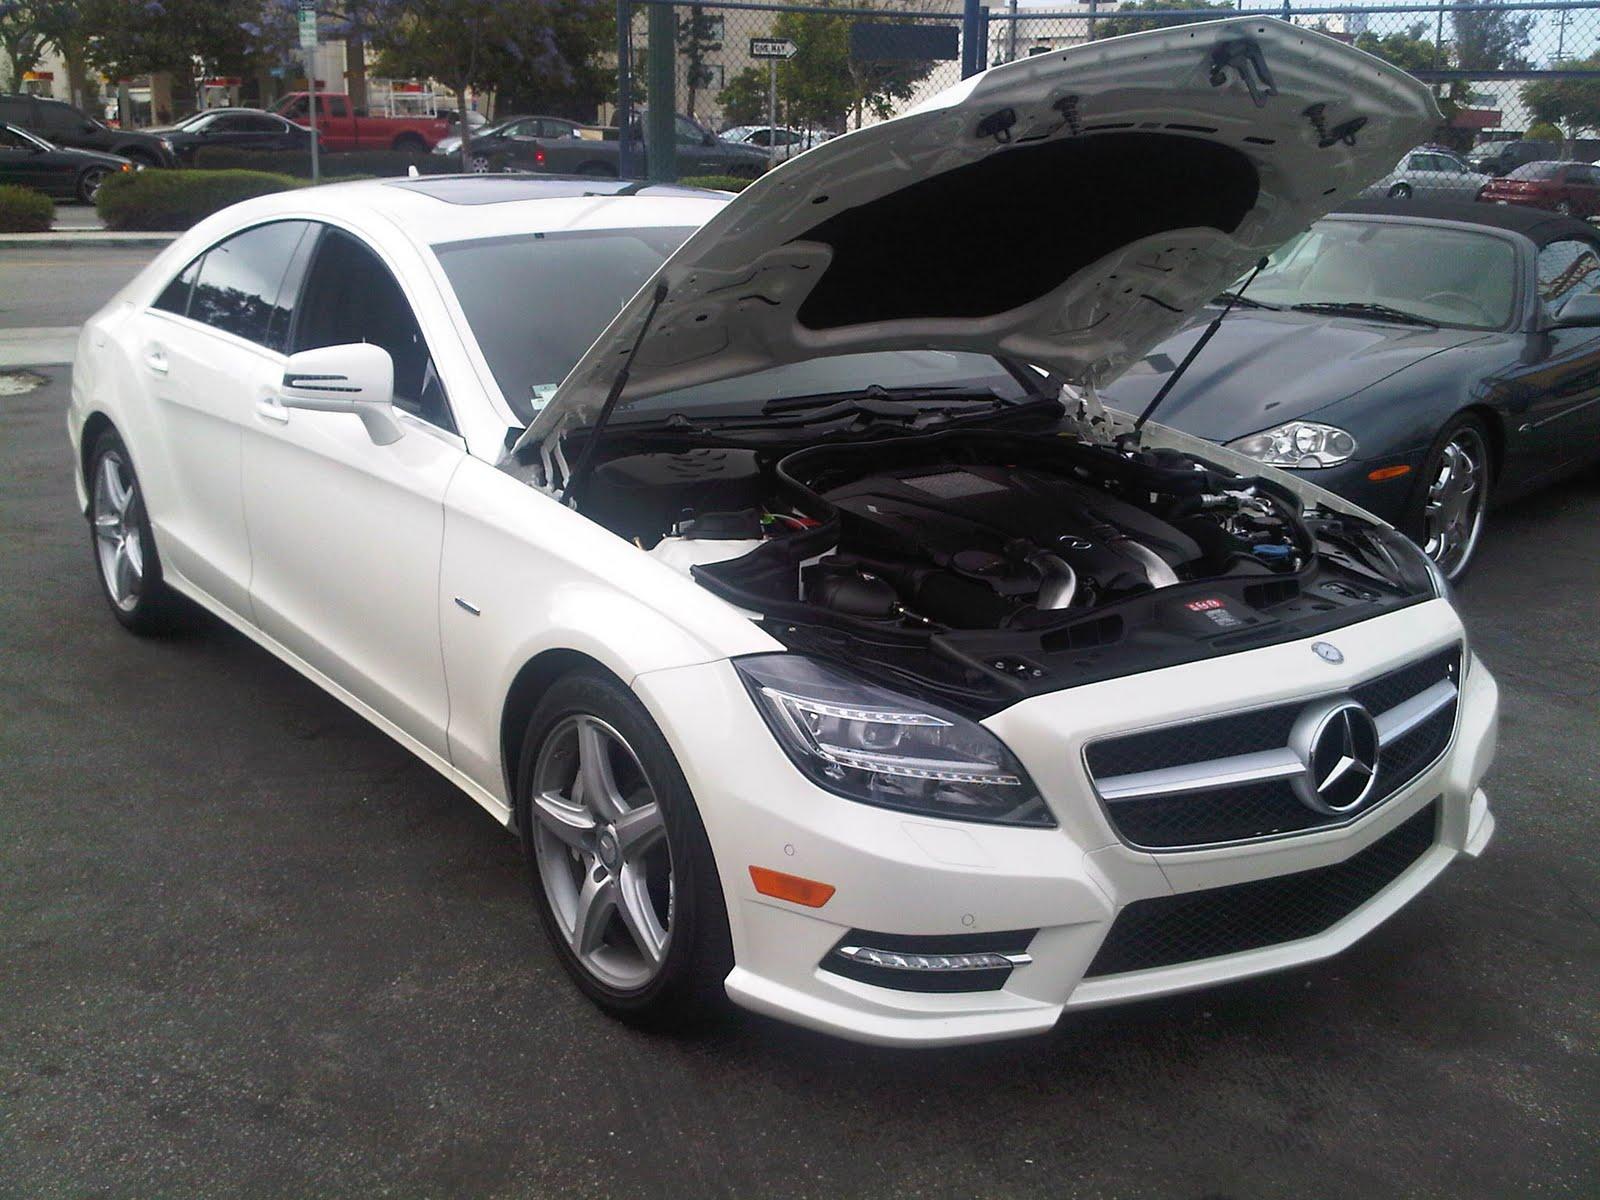 Mercedes Cls550 Price